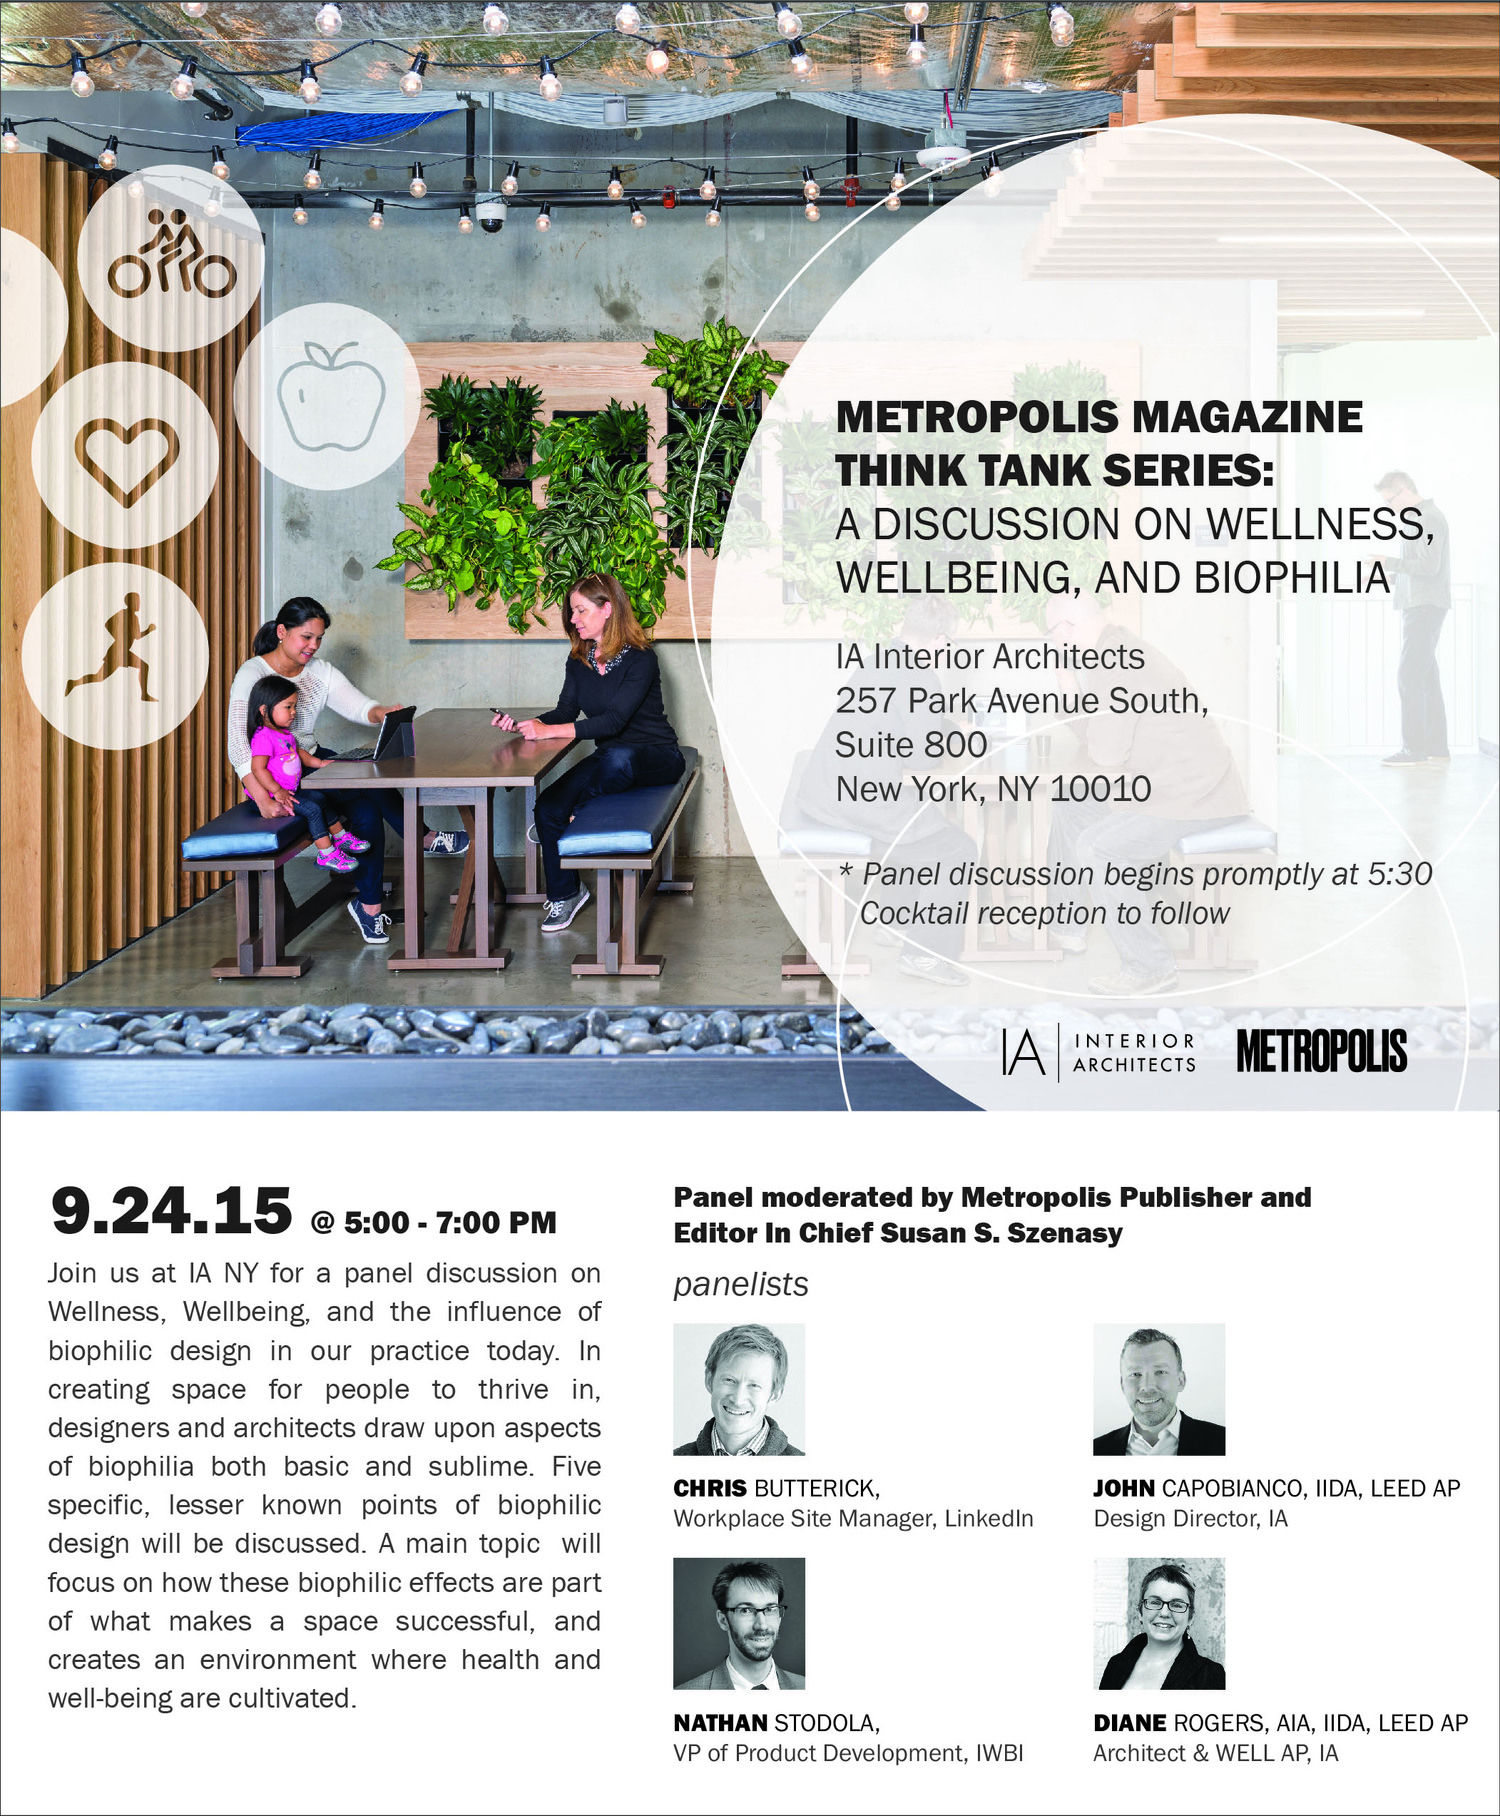 Metropolis Magazine - Think Tank Series: Discussion on Wellness